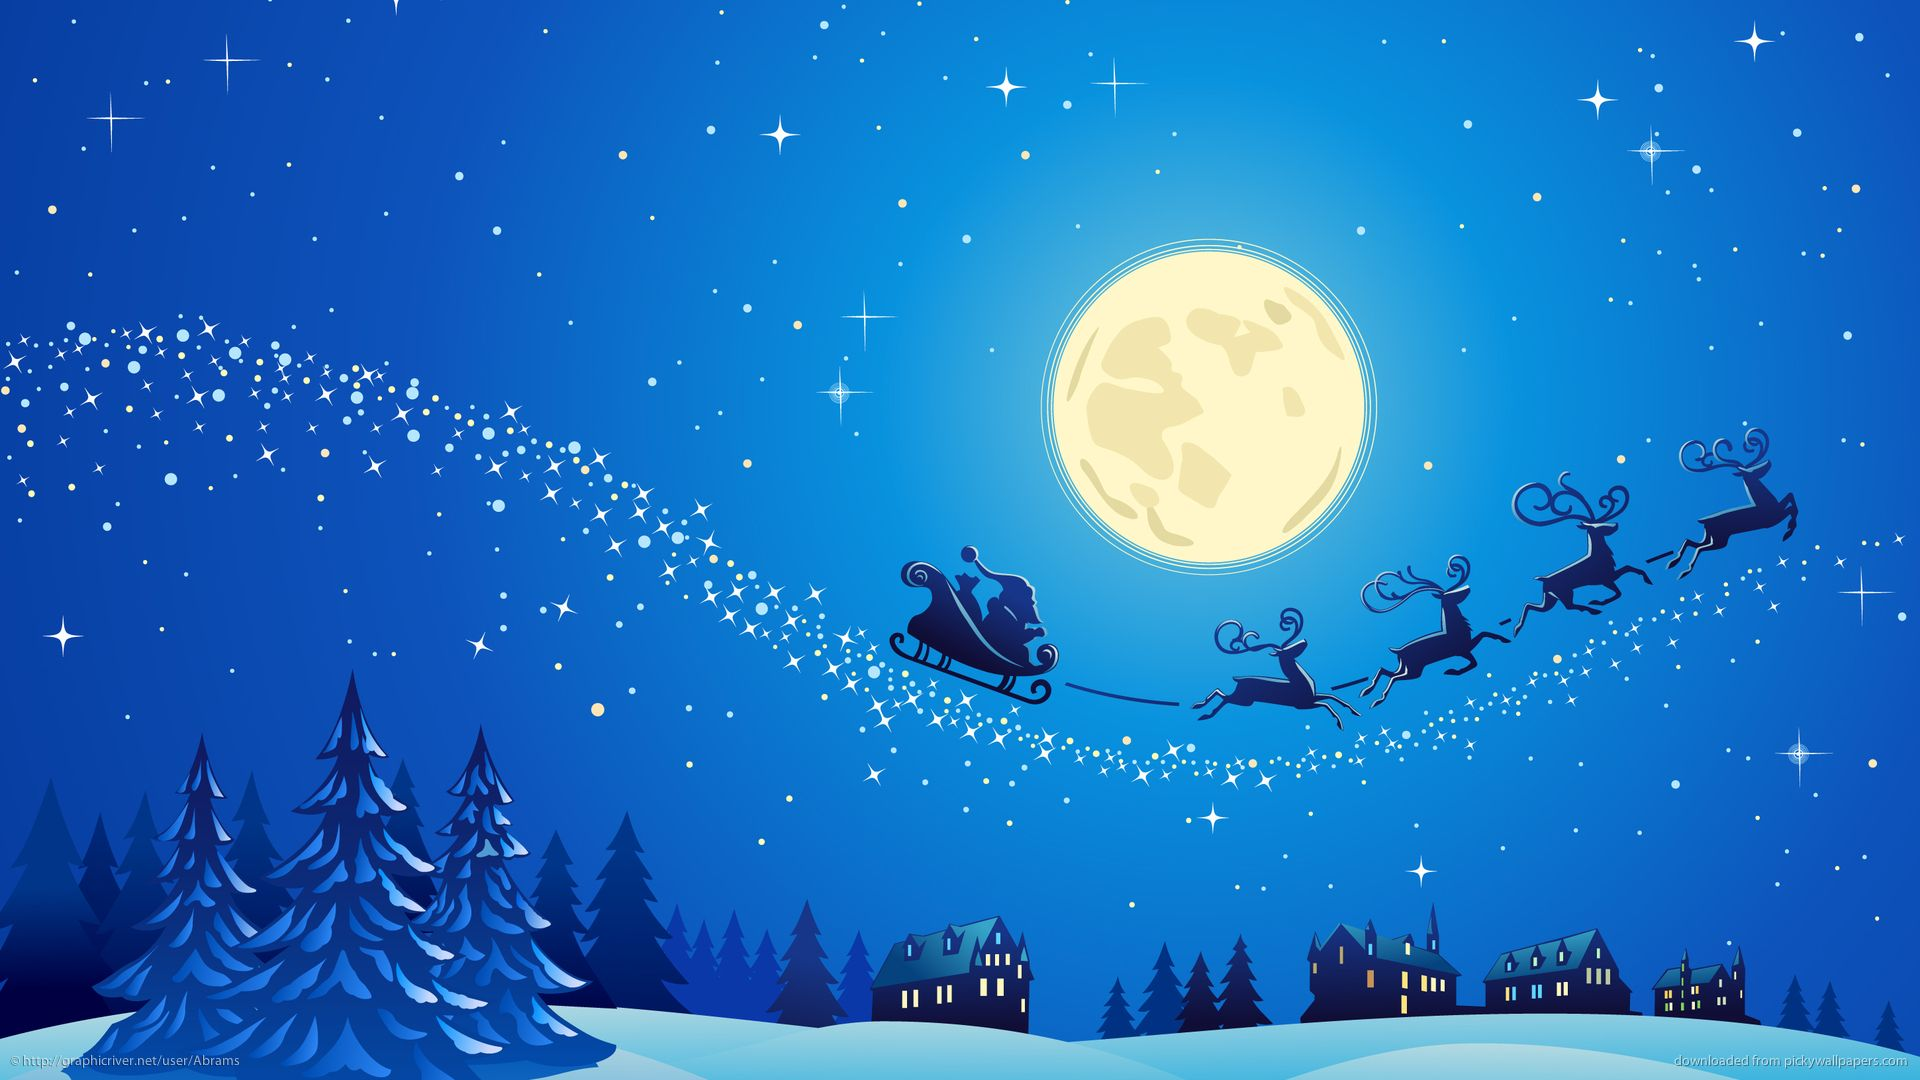 Http Wallpaper Pickywallpapers Com 1920x1080 Santa Into The Winter Christmas Night 2 Jp Christmas Wallpaper Hd Christmas Wallpaper Cute Christmas Backgrounds